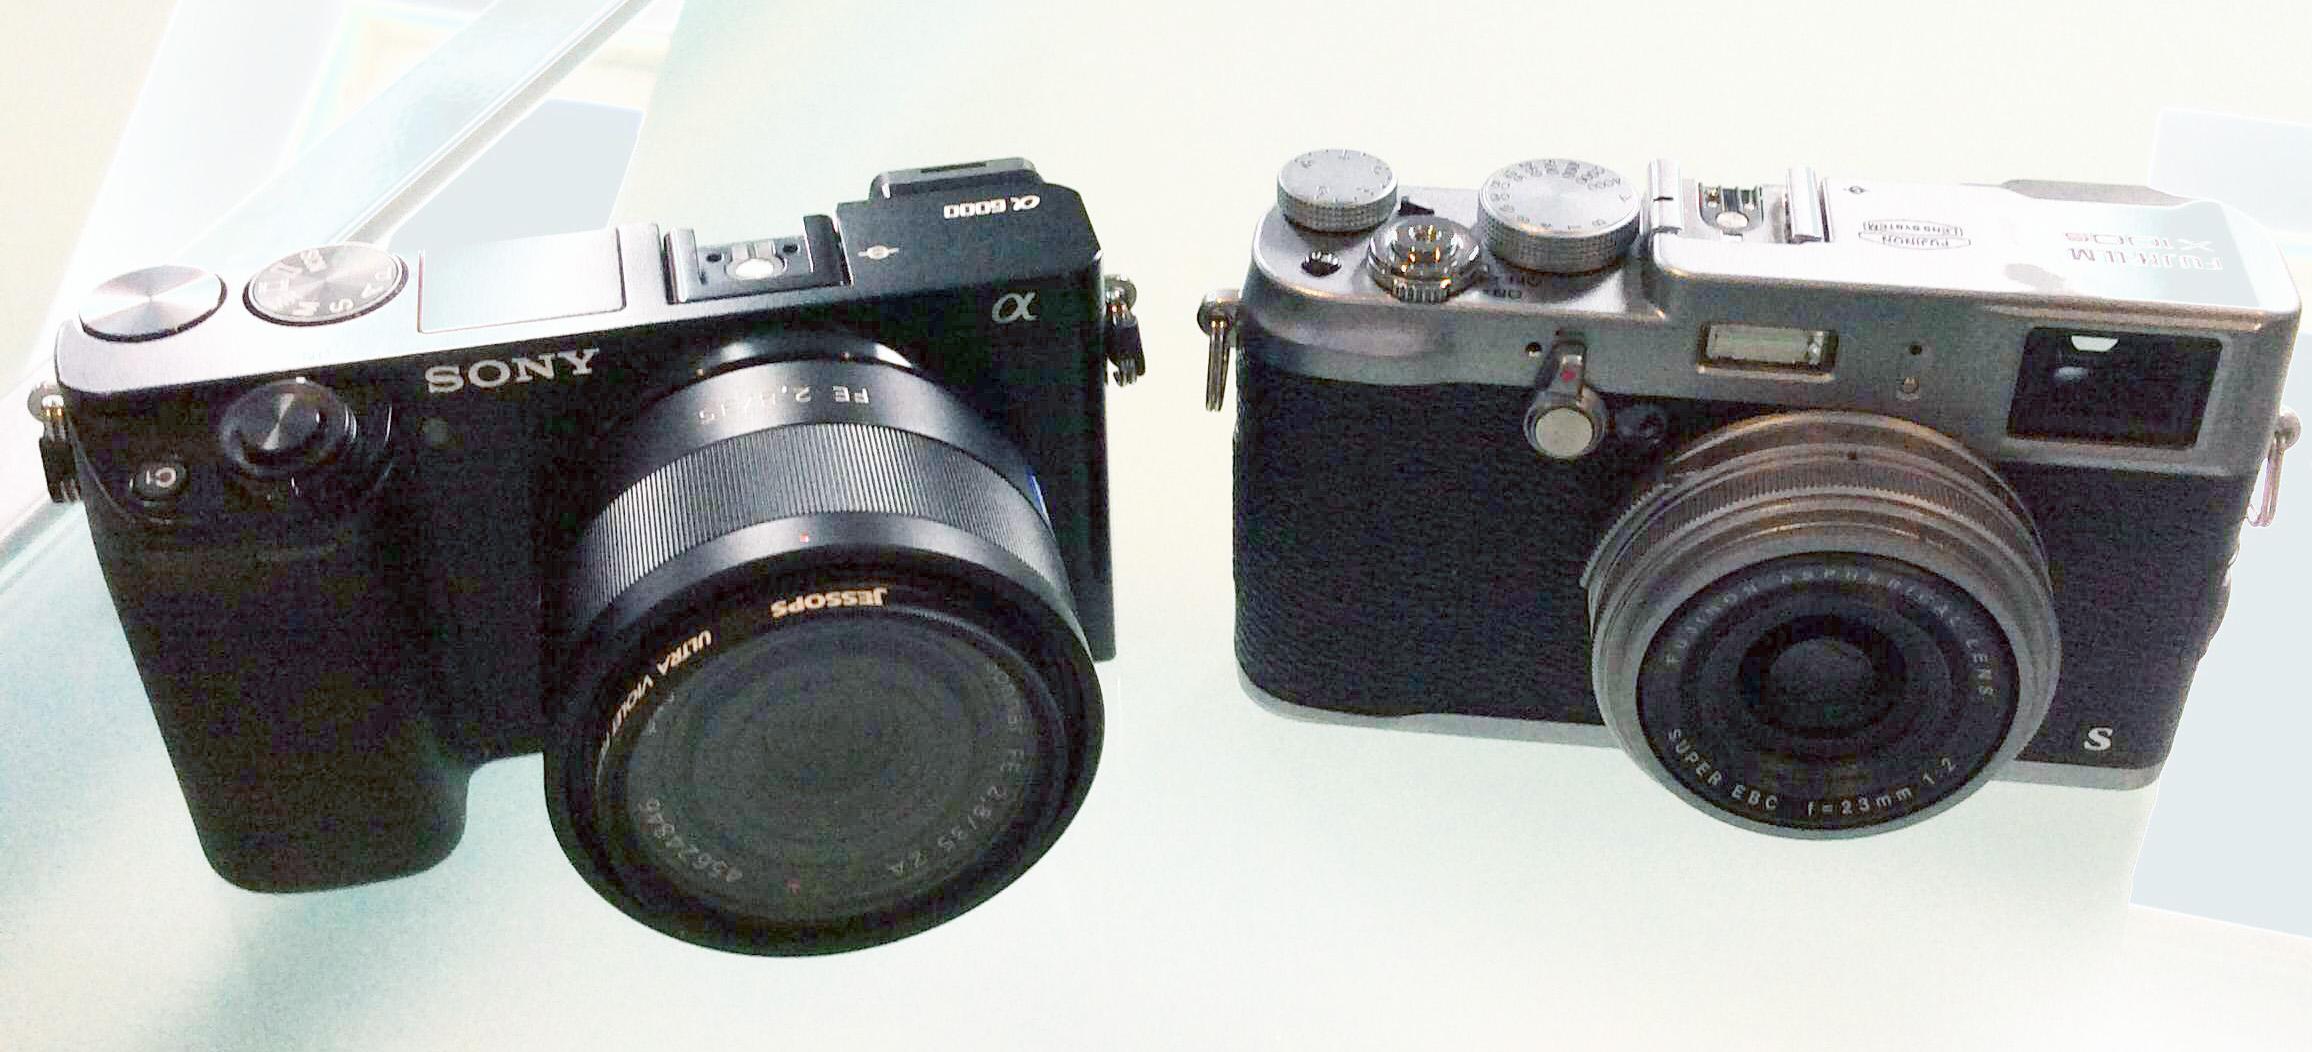 Sony a6000,  Sony FE 35mm f2.8 ZA Carl Zeiss Sonnar T* Lens, Fuji X100s